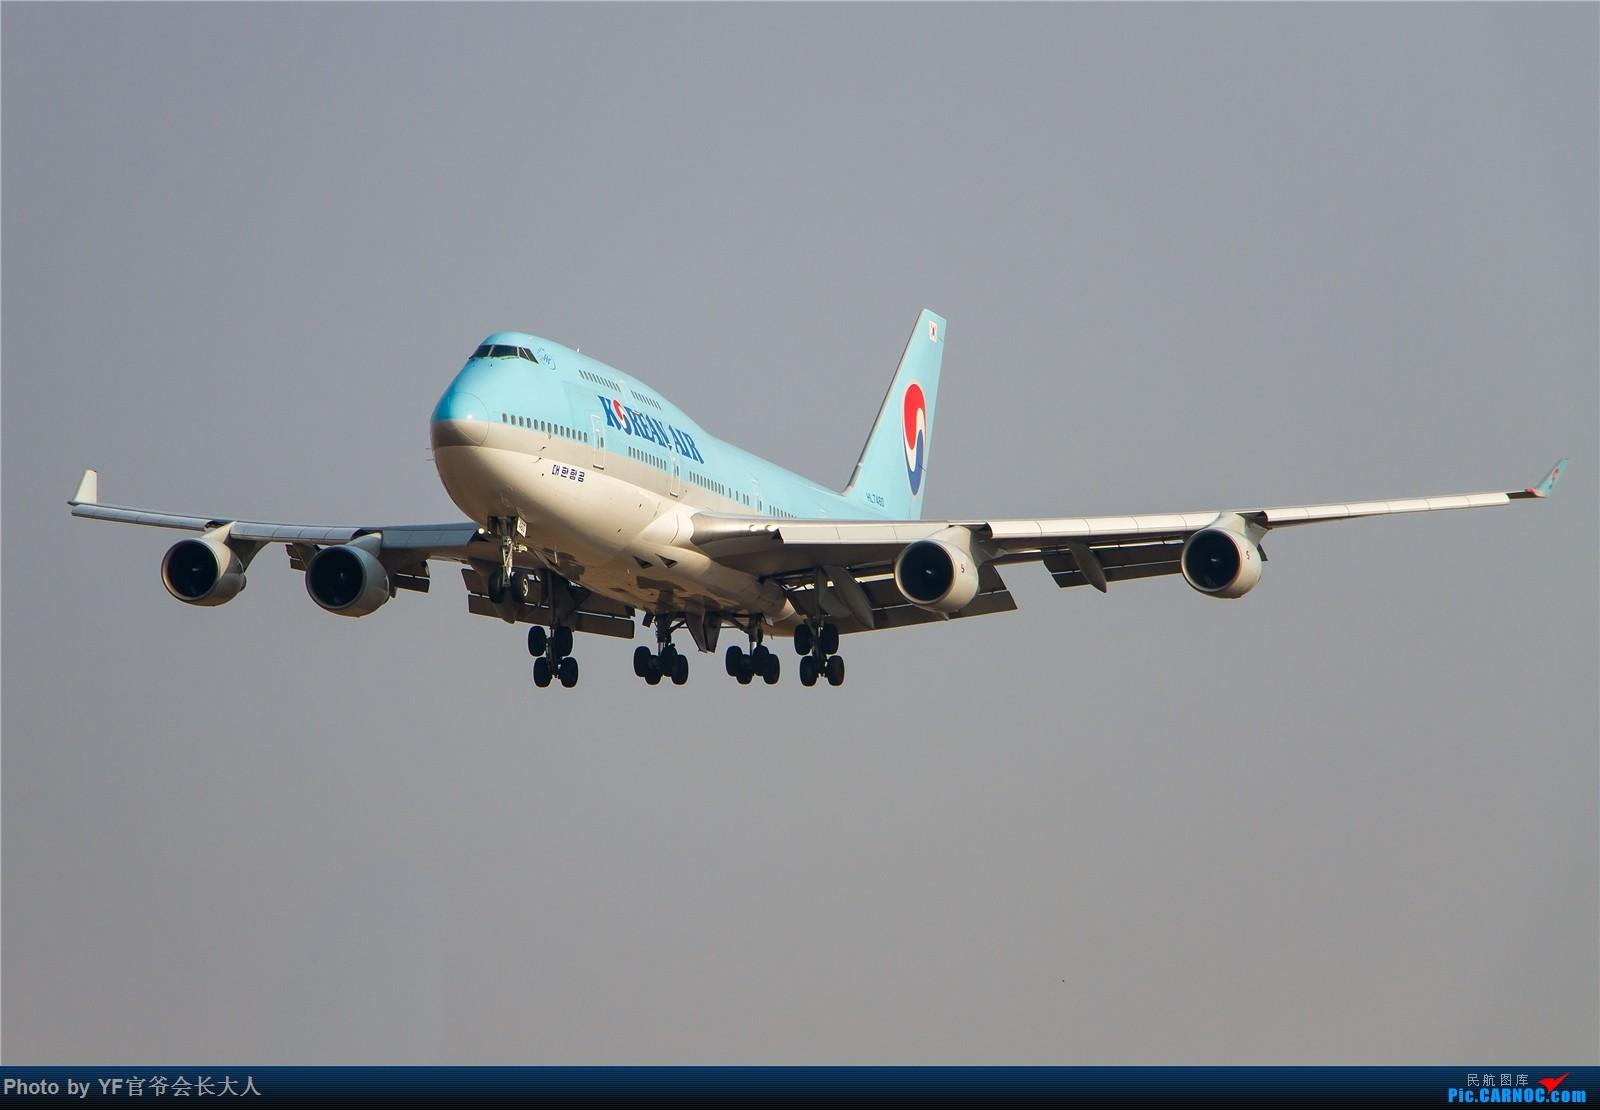 Re:[原创]【ZYTX】【1600*1066】论坛首发:俄罗斯艾菲航空公司波音757-28A,注册号:EI-EWT,还有757斯基以及最近新拍机点拍的一些好货 BOEING 747-400 HL7460 中国沈阳桃仙国际机场